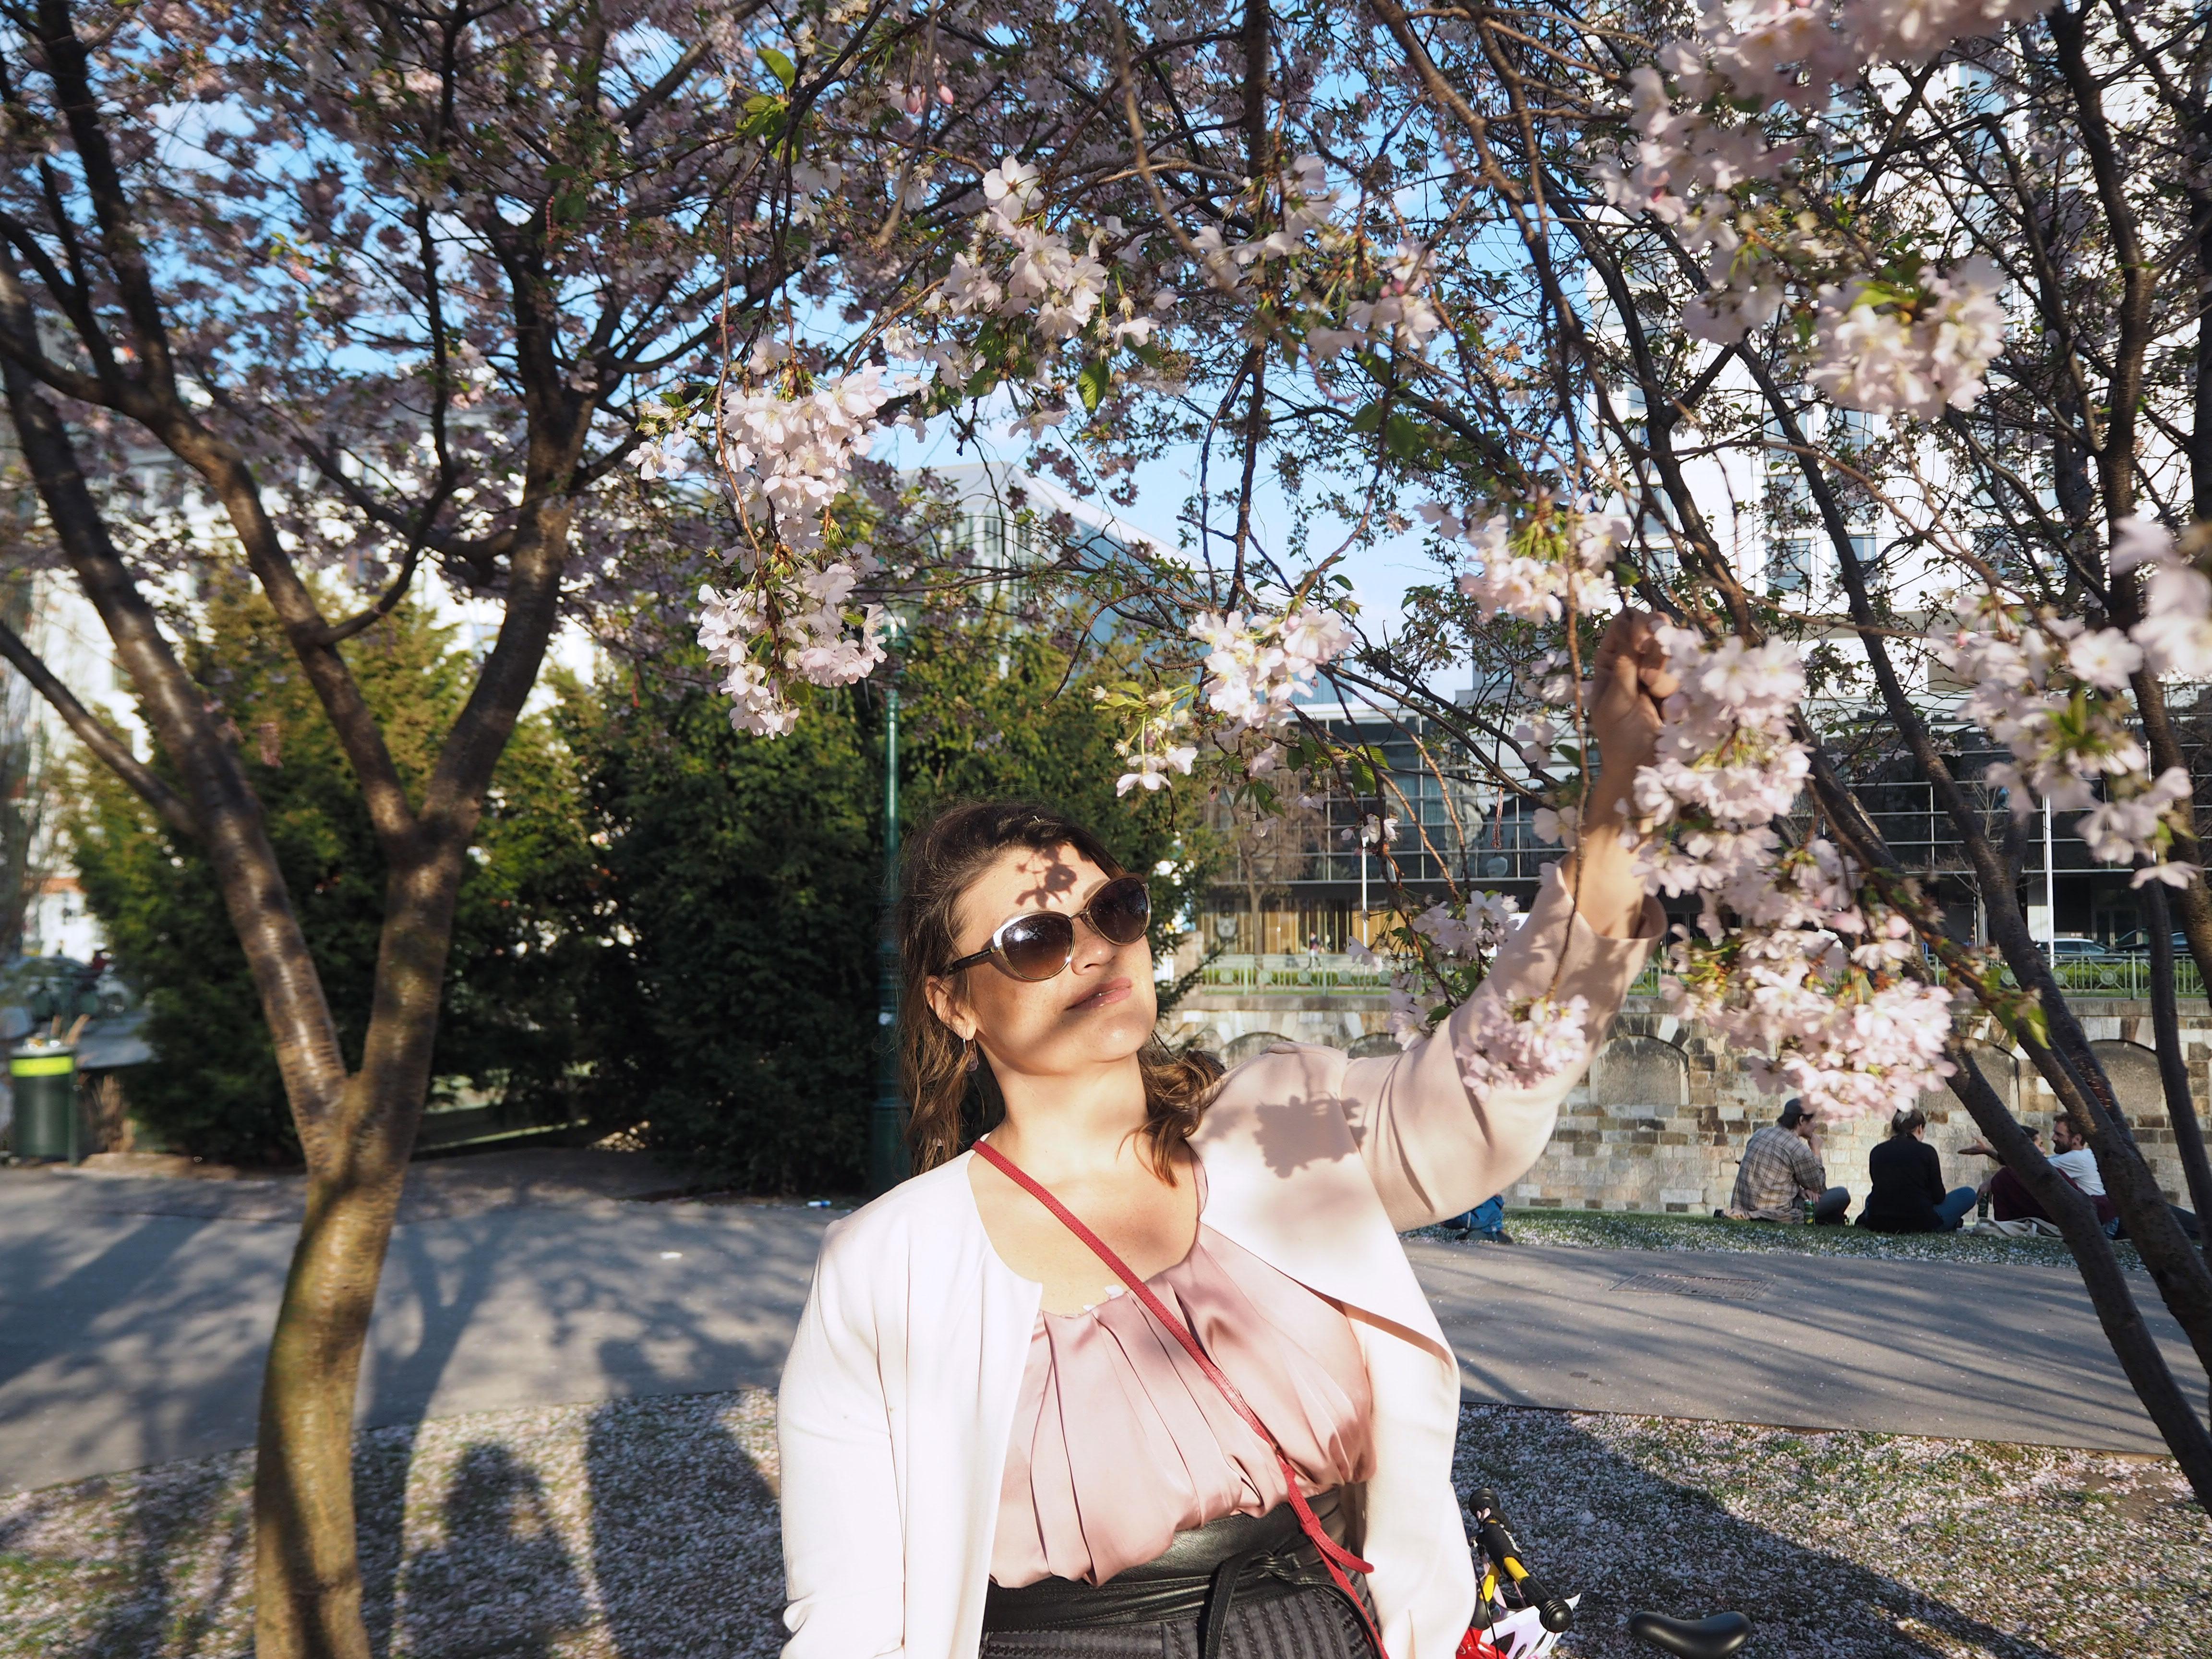 cherry-blossom-sakura-spring-look-rosé-mantel-h&m-tellerrock-fashion-my-look-plus-size-blogger-kardiaserena-marc-jacobs-sonnenbrille